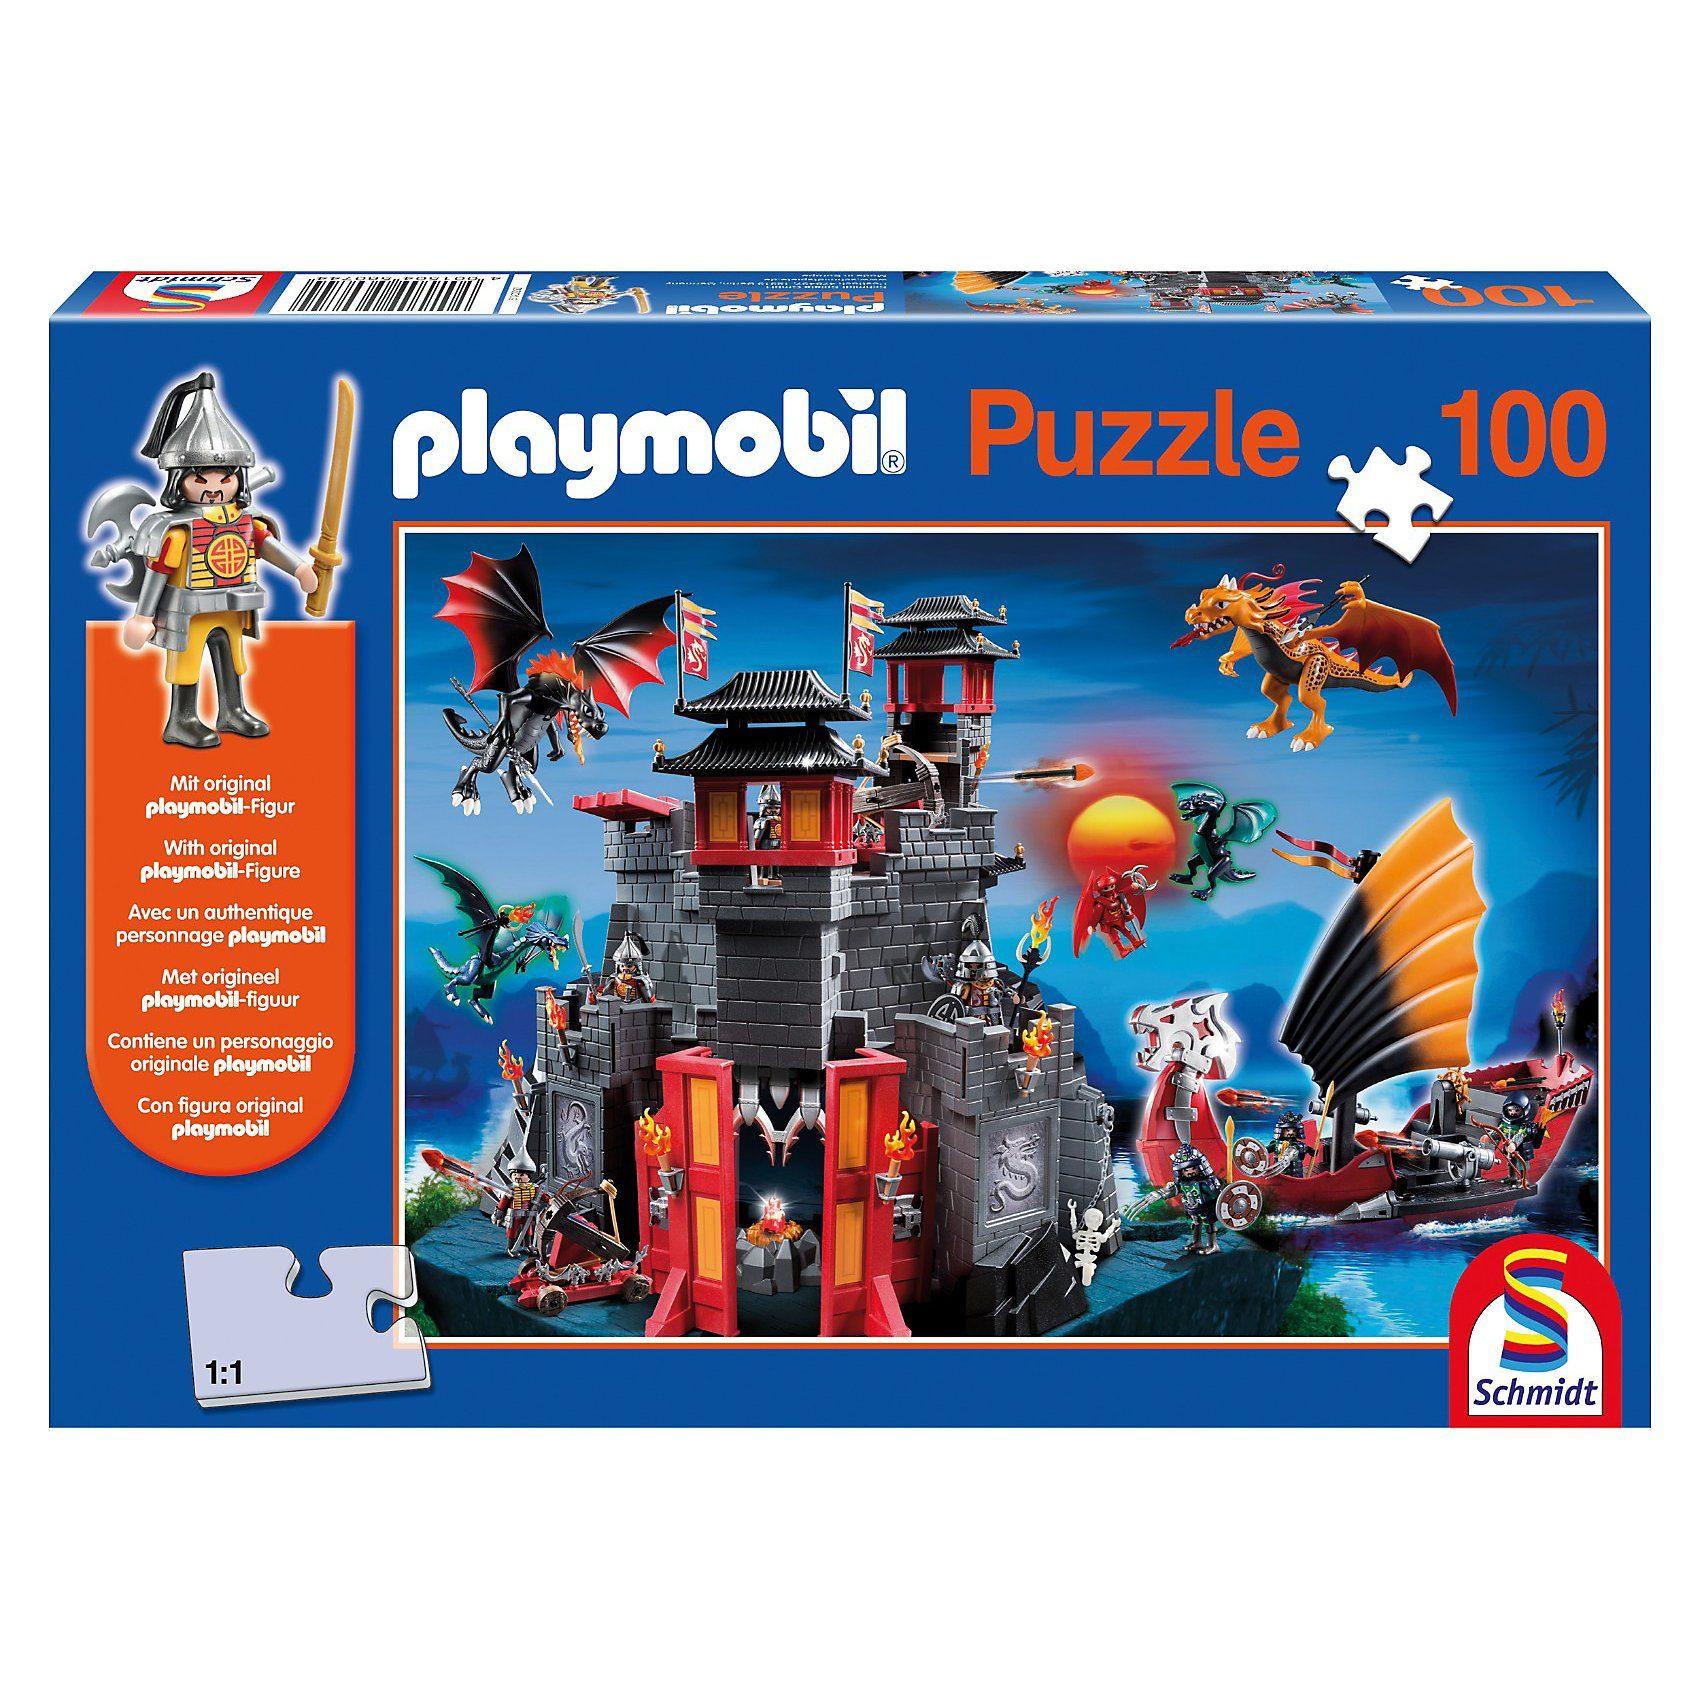 Schmidt Spiele Asia-Drachenland, 100 Teile, Kinderpuzzle Playmobil mit Figu